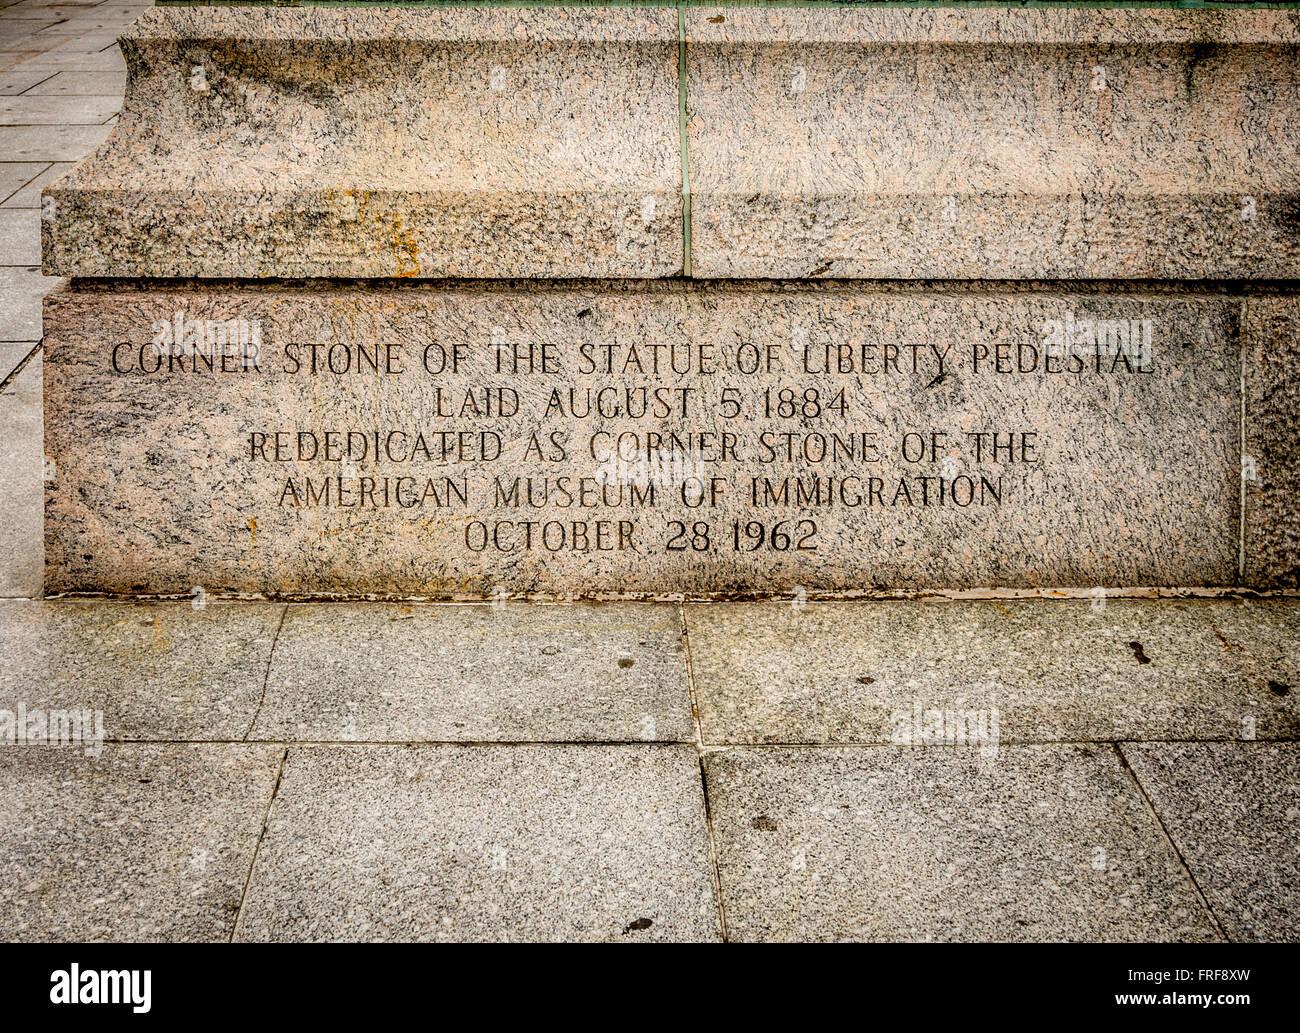 Statue of Liberty Pedestal Corner Stone, Liberty Island, New York City, USA. - Stock Image